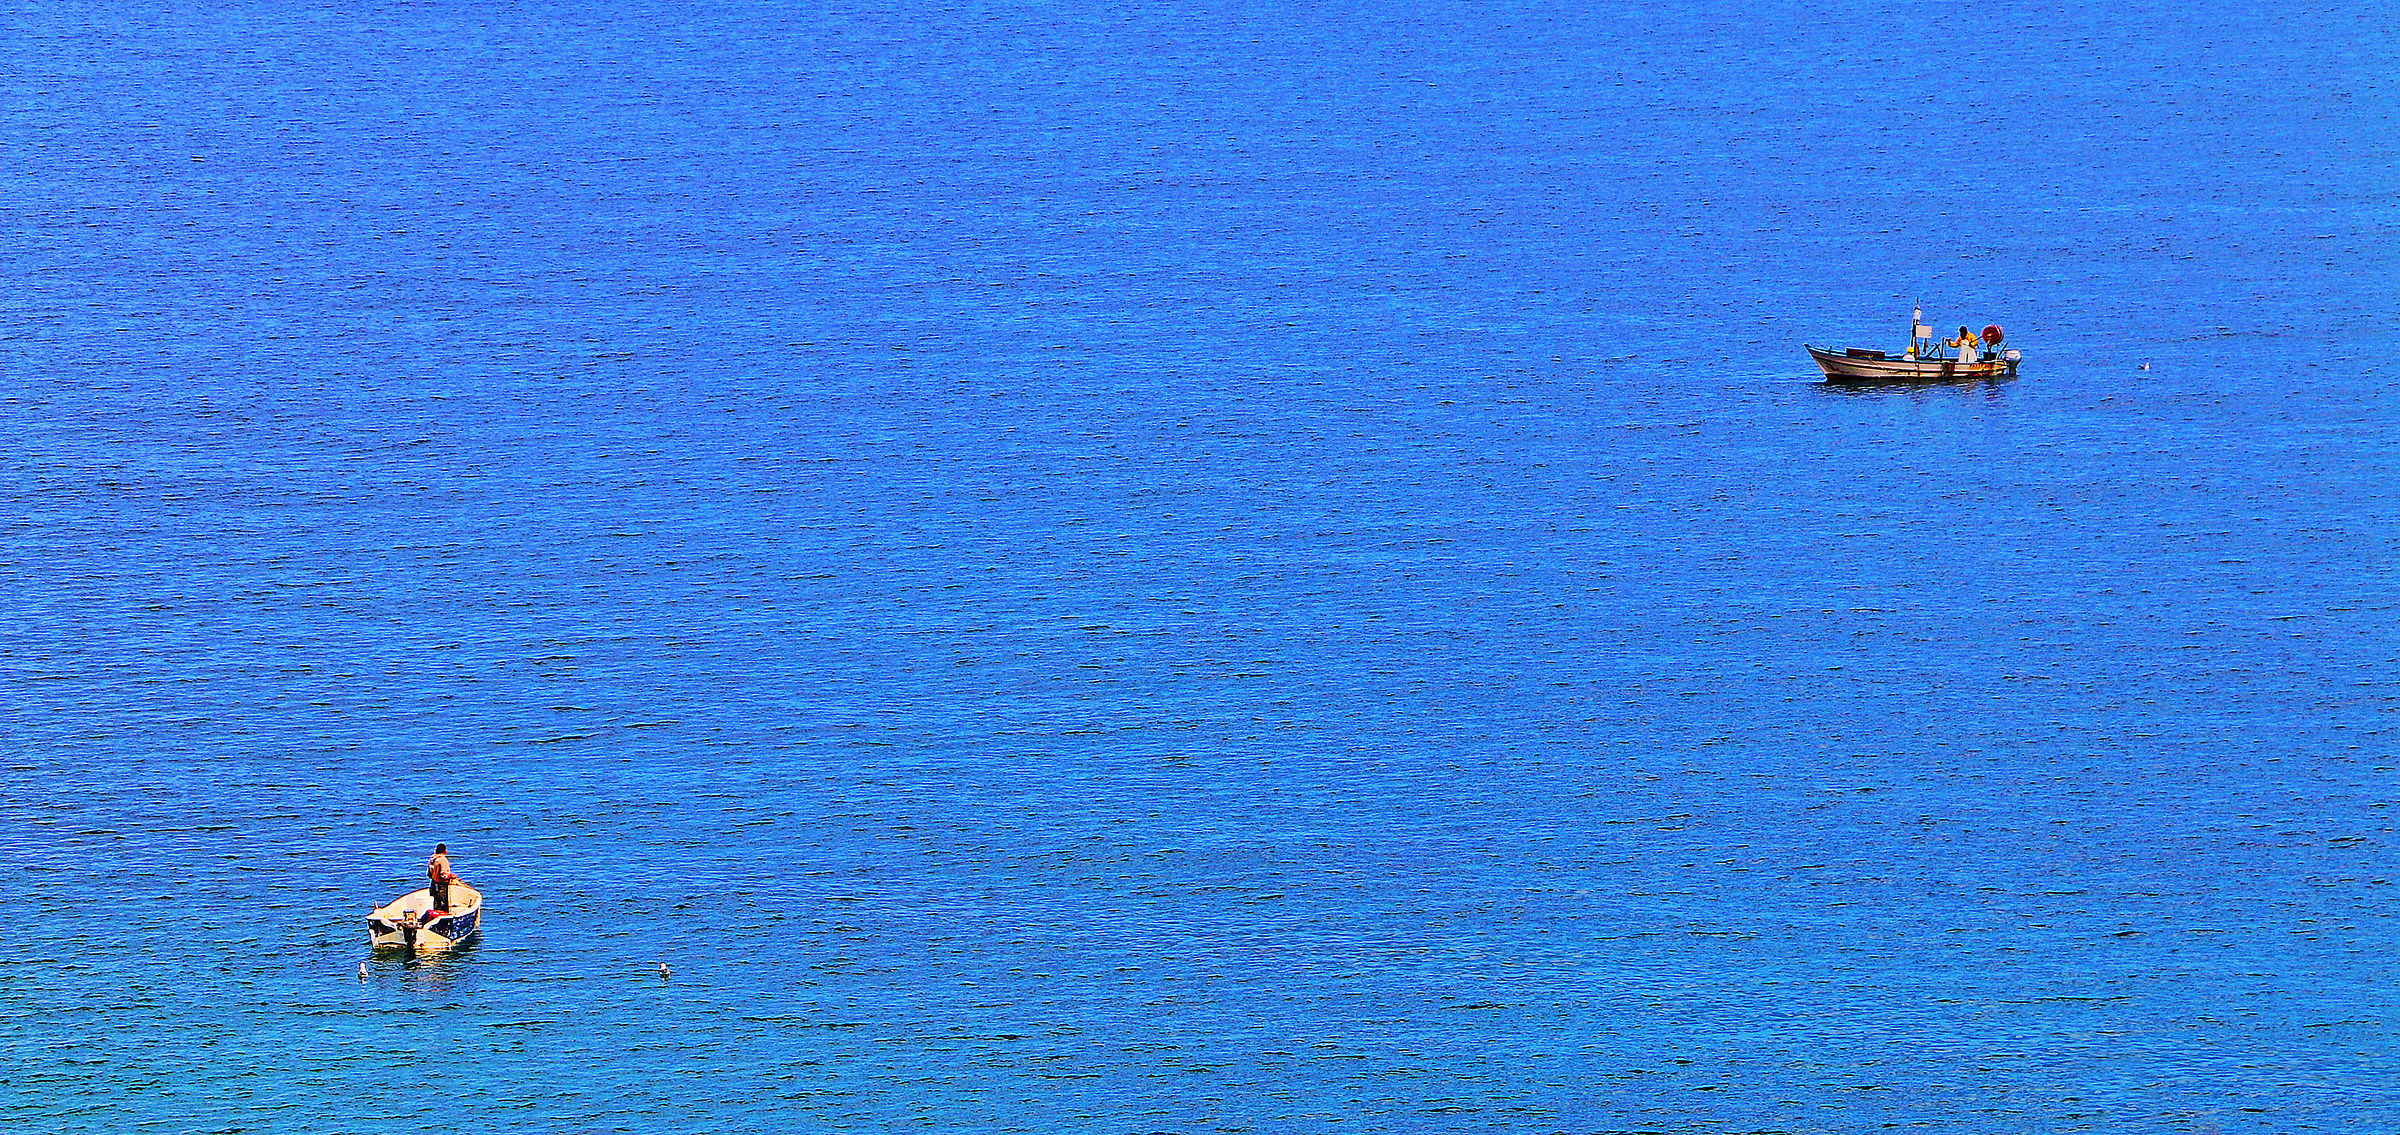 The sea......